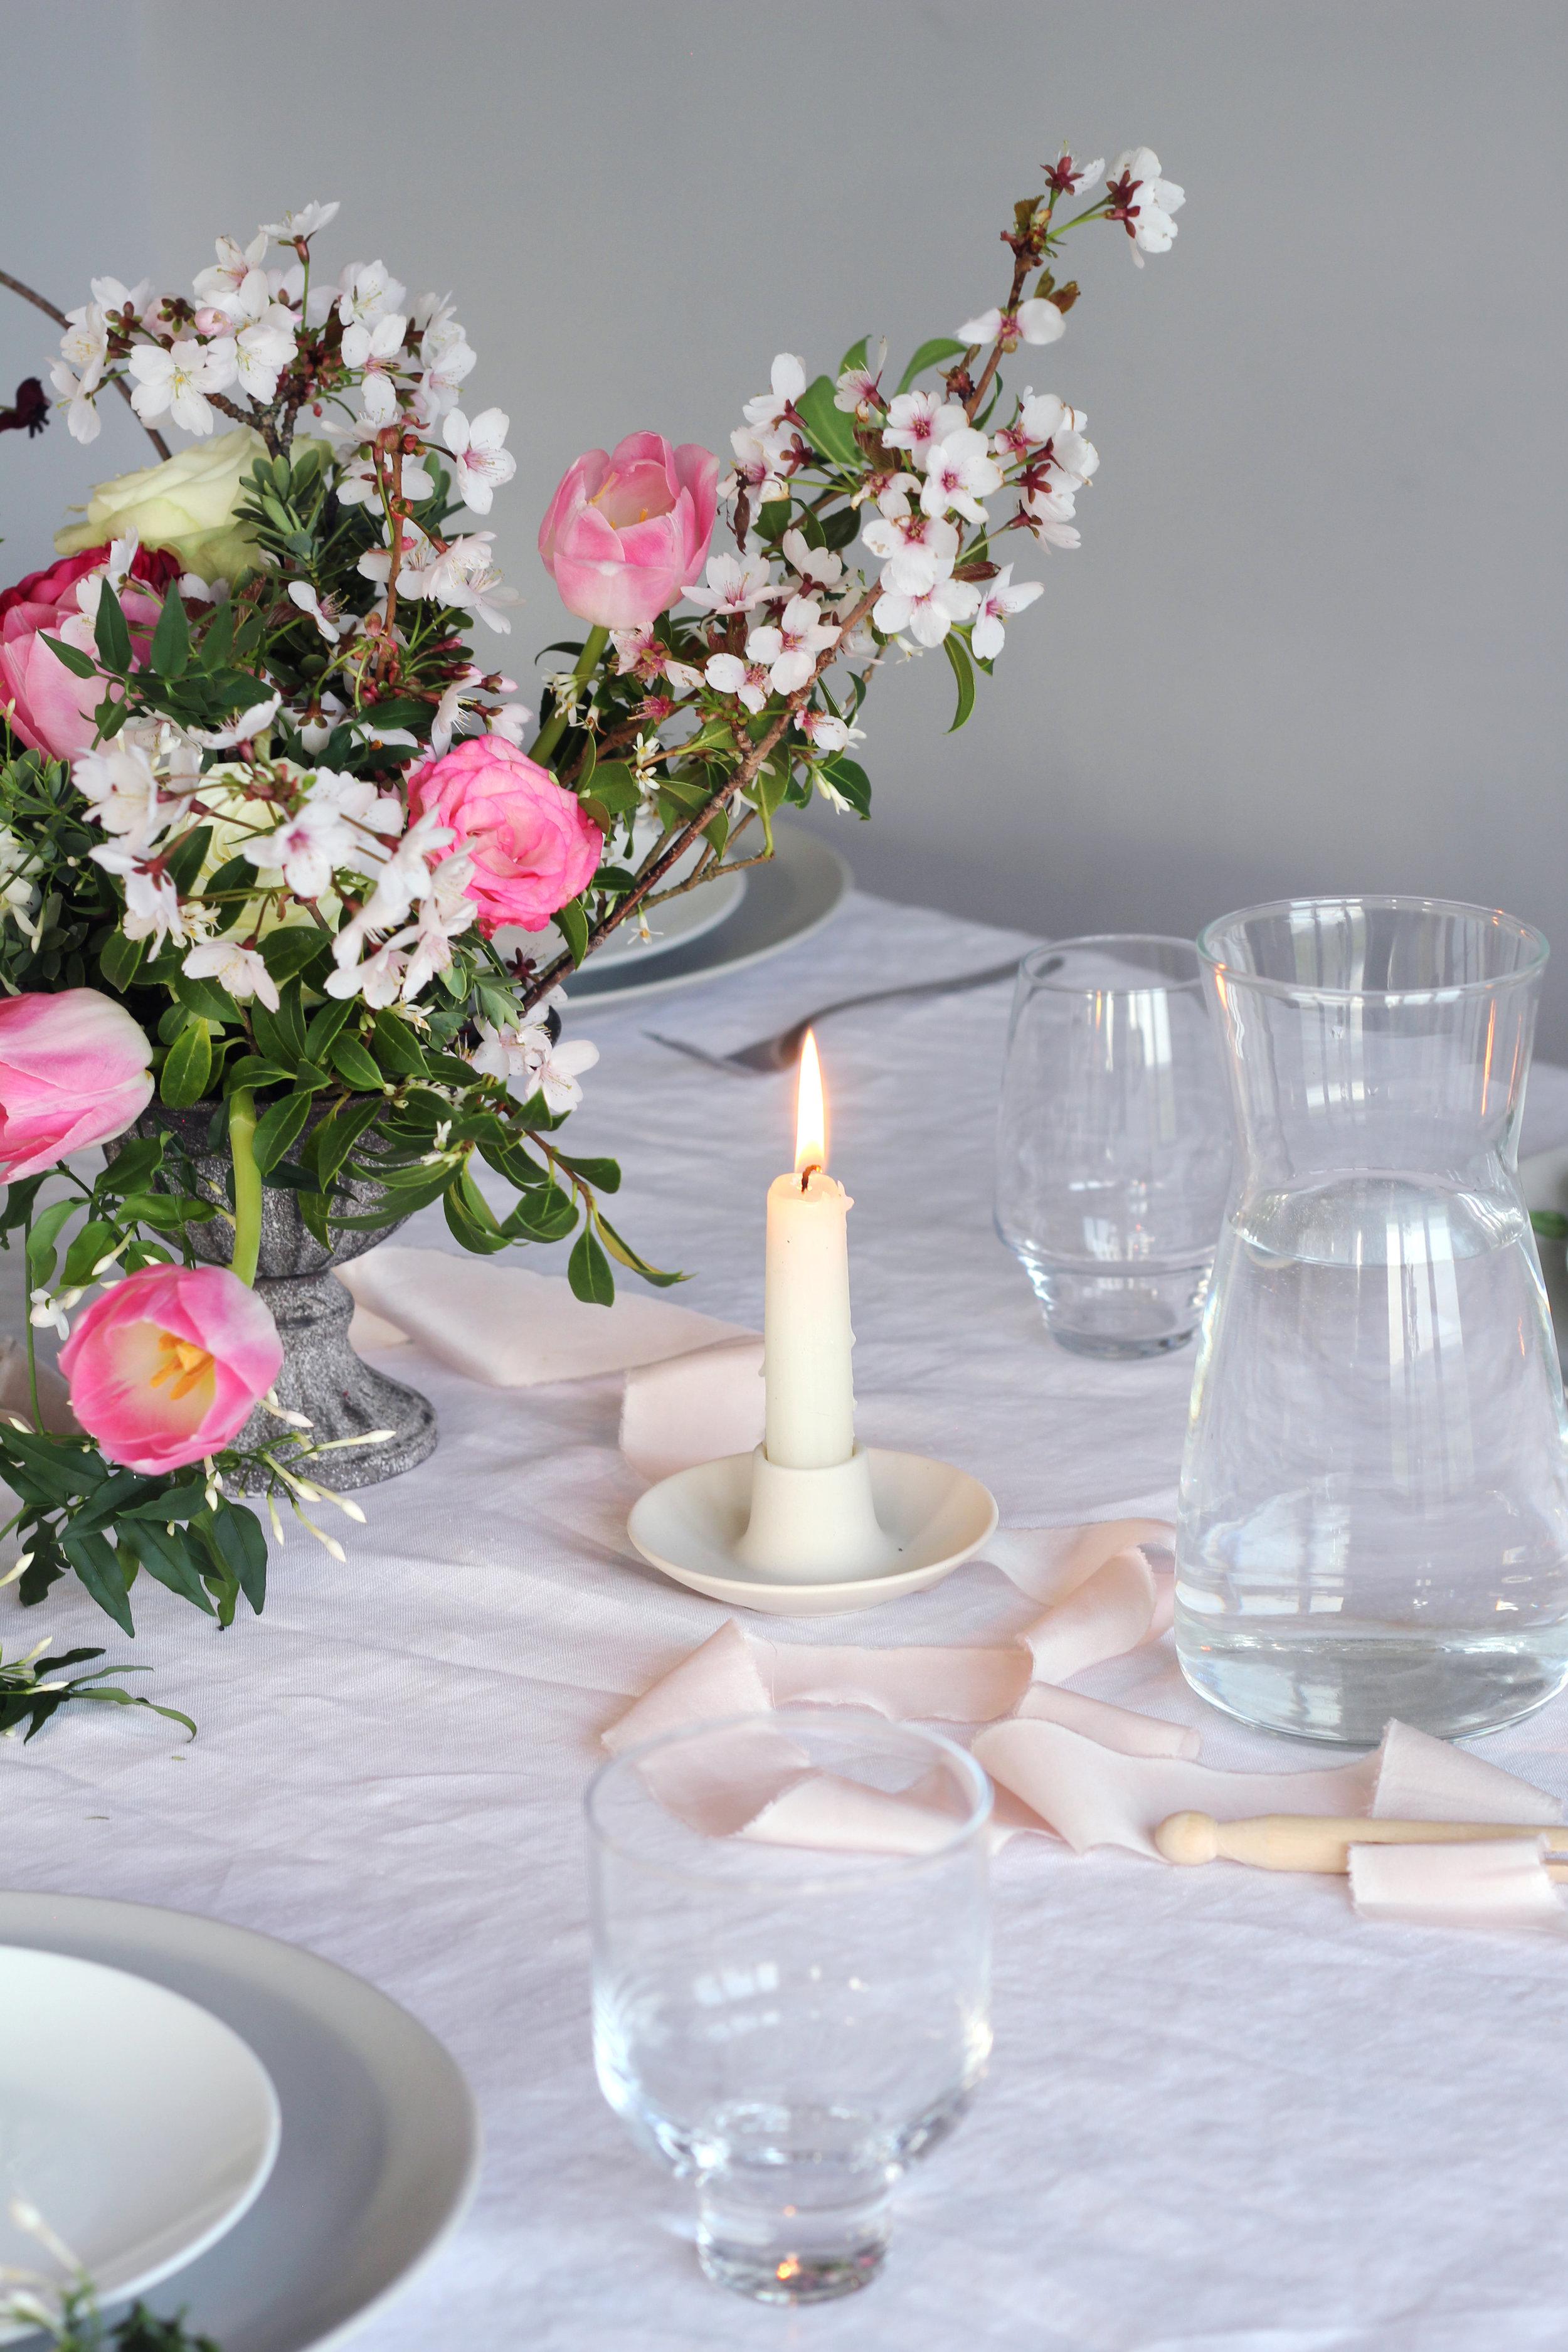 Callie-Pettigrew-Springtime-Wedding-1.jpg